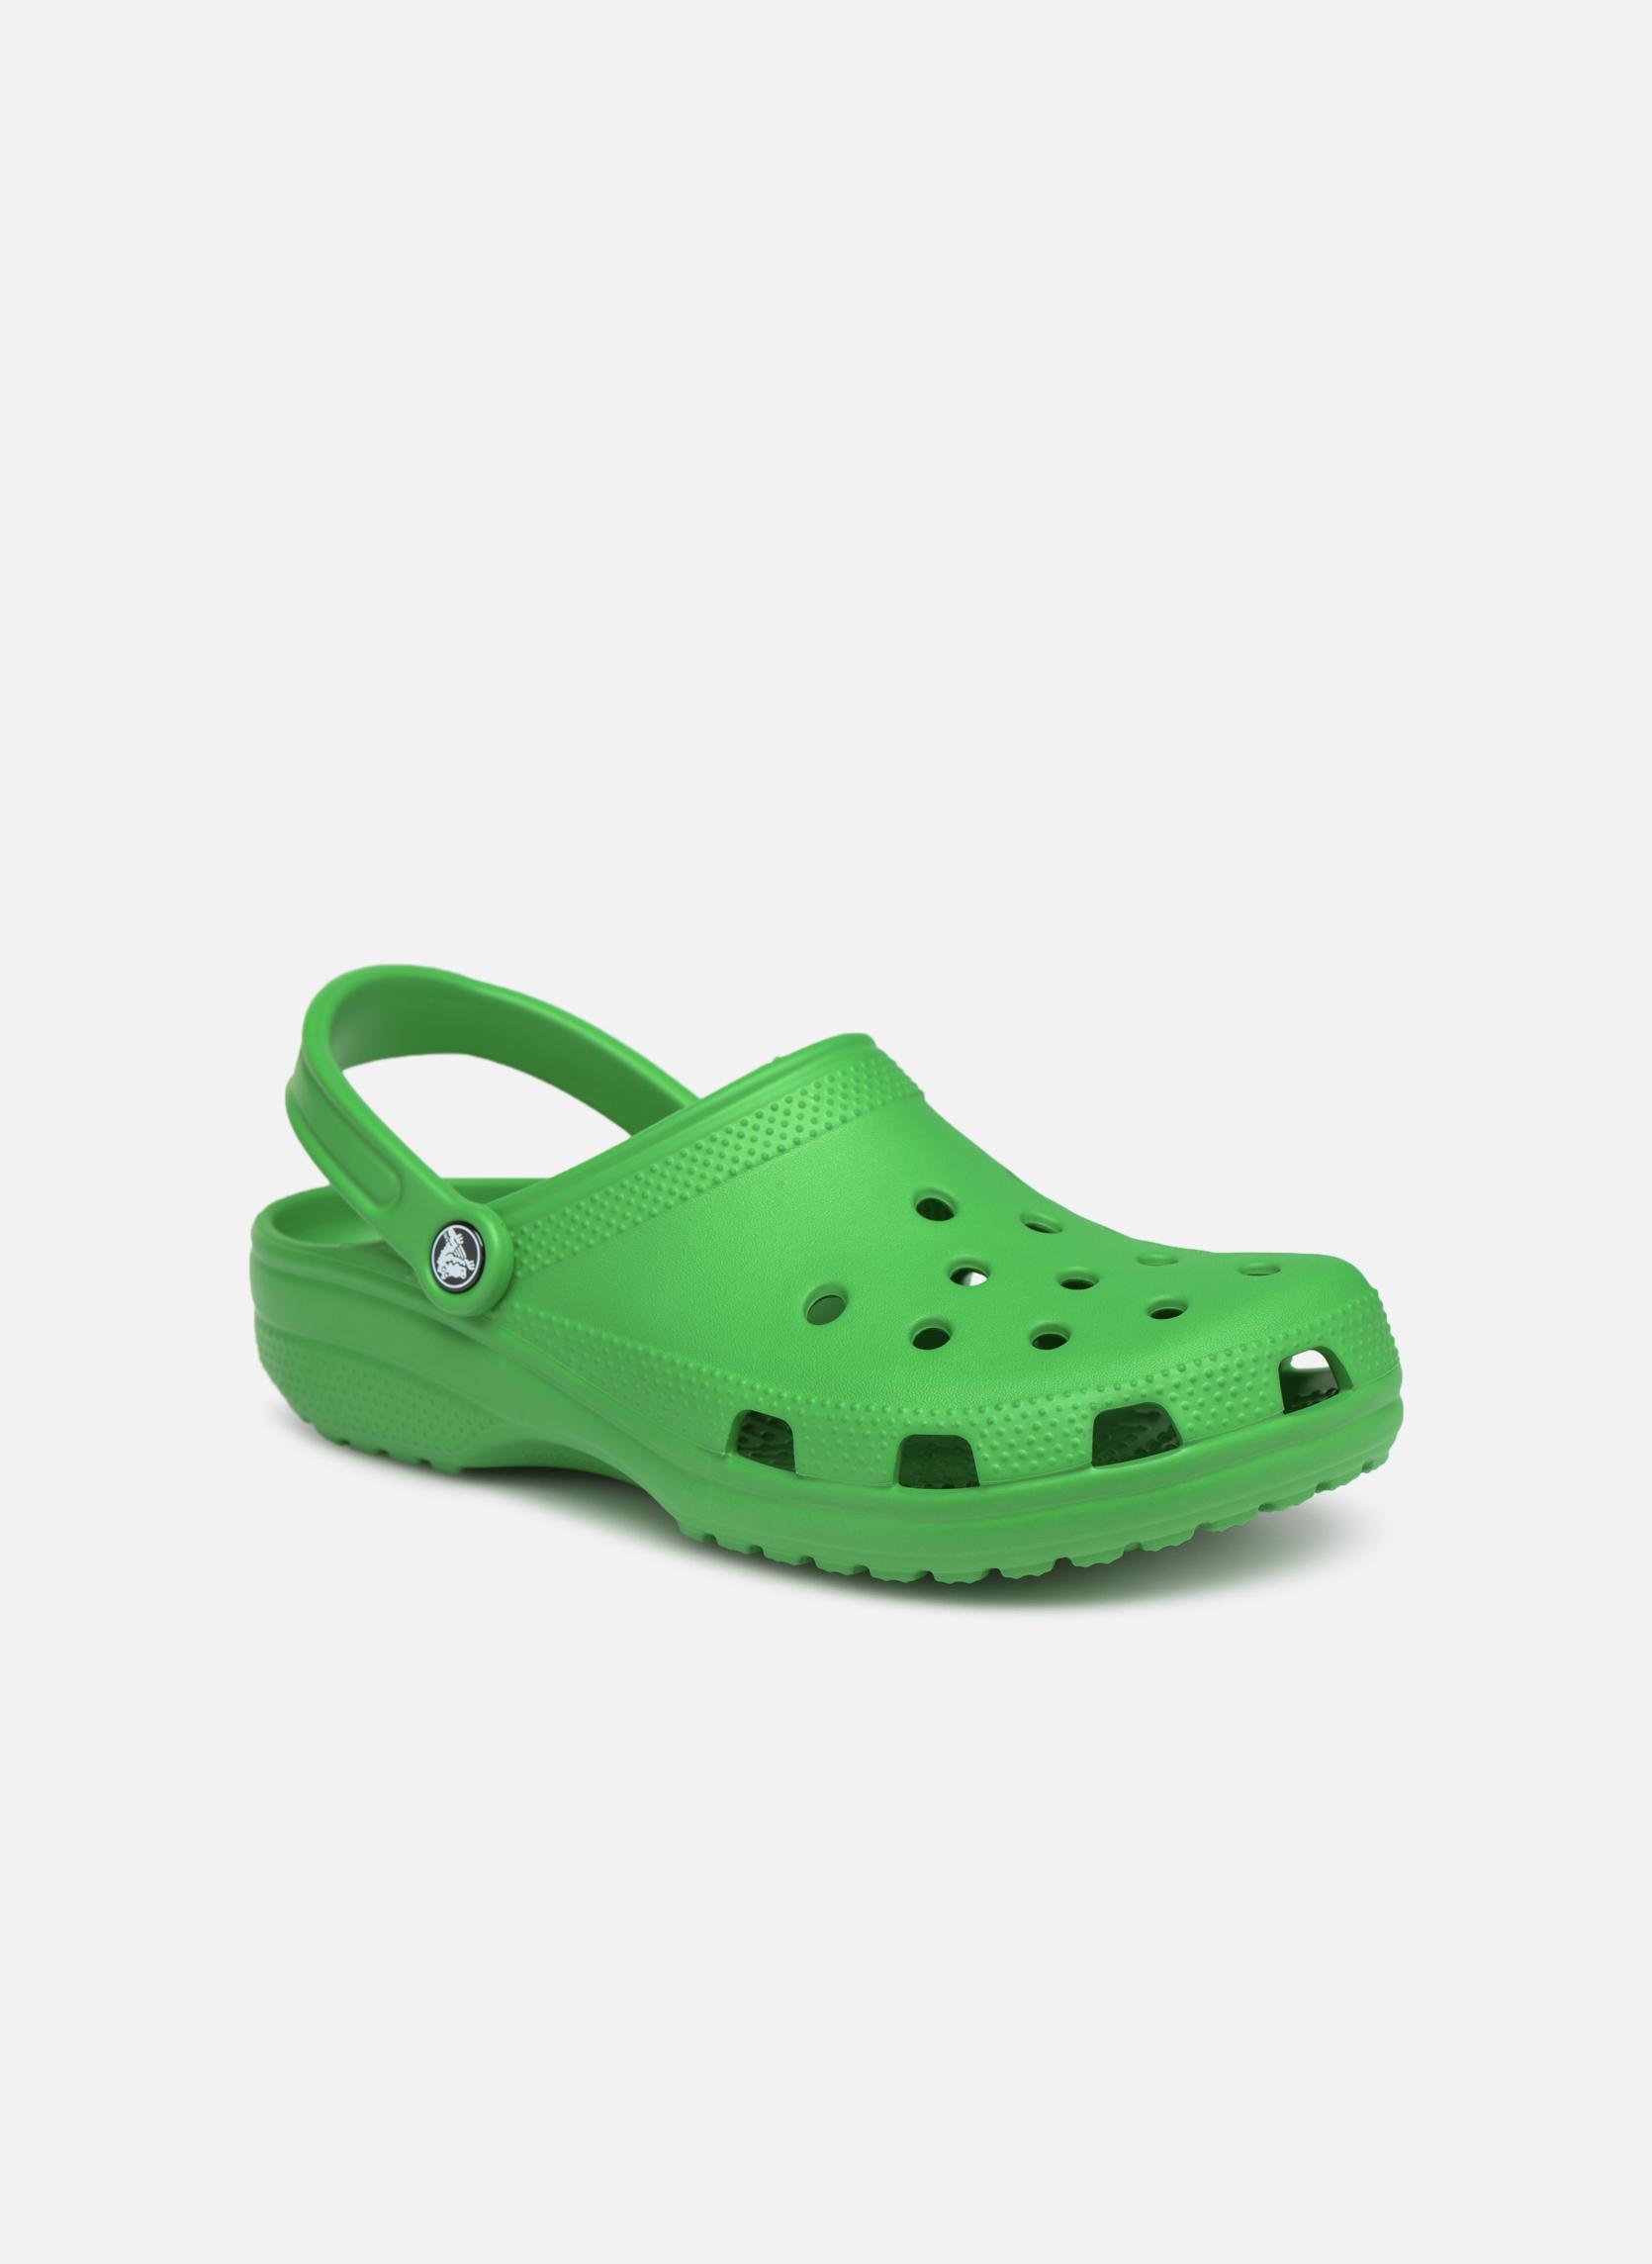 Crocs - Herren - Cayman H - Sandalen - grün wBbkd9VR